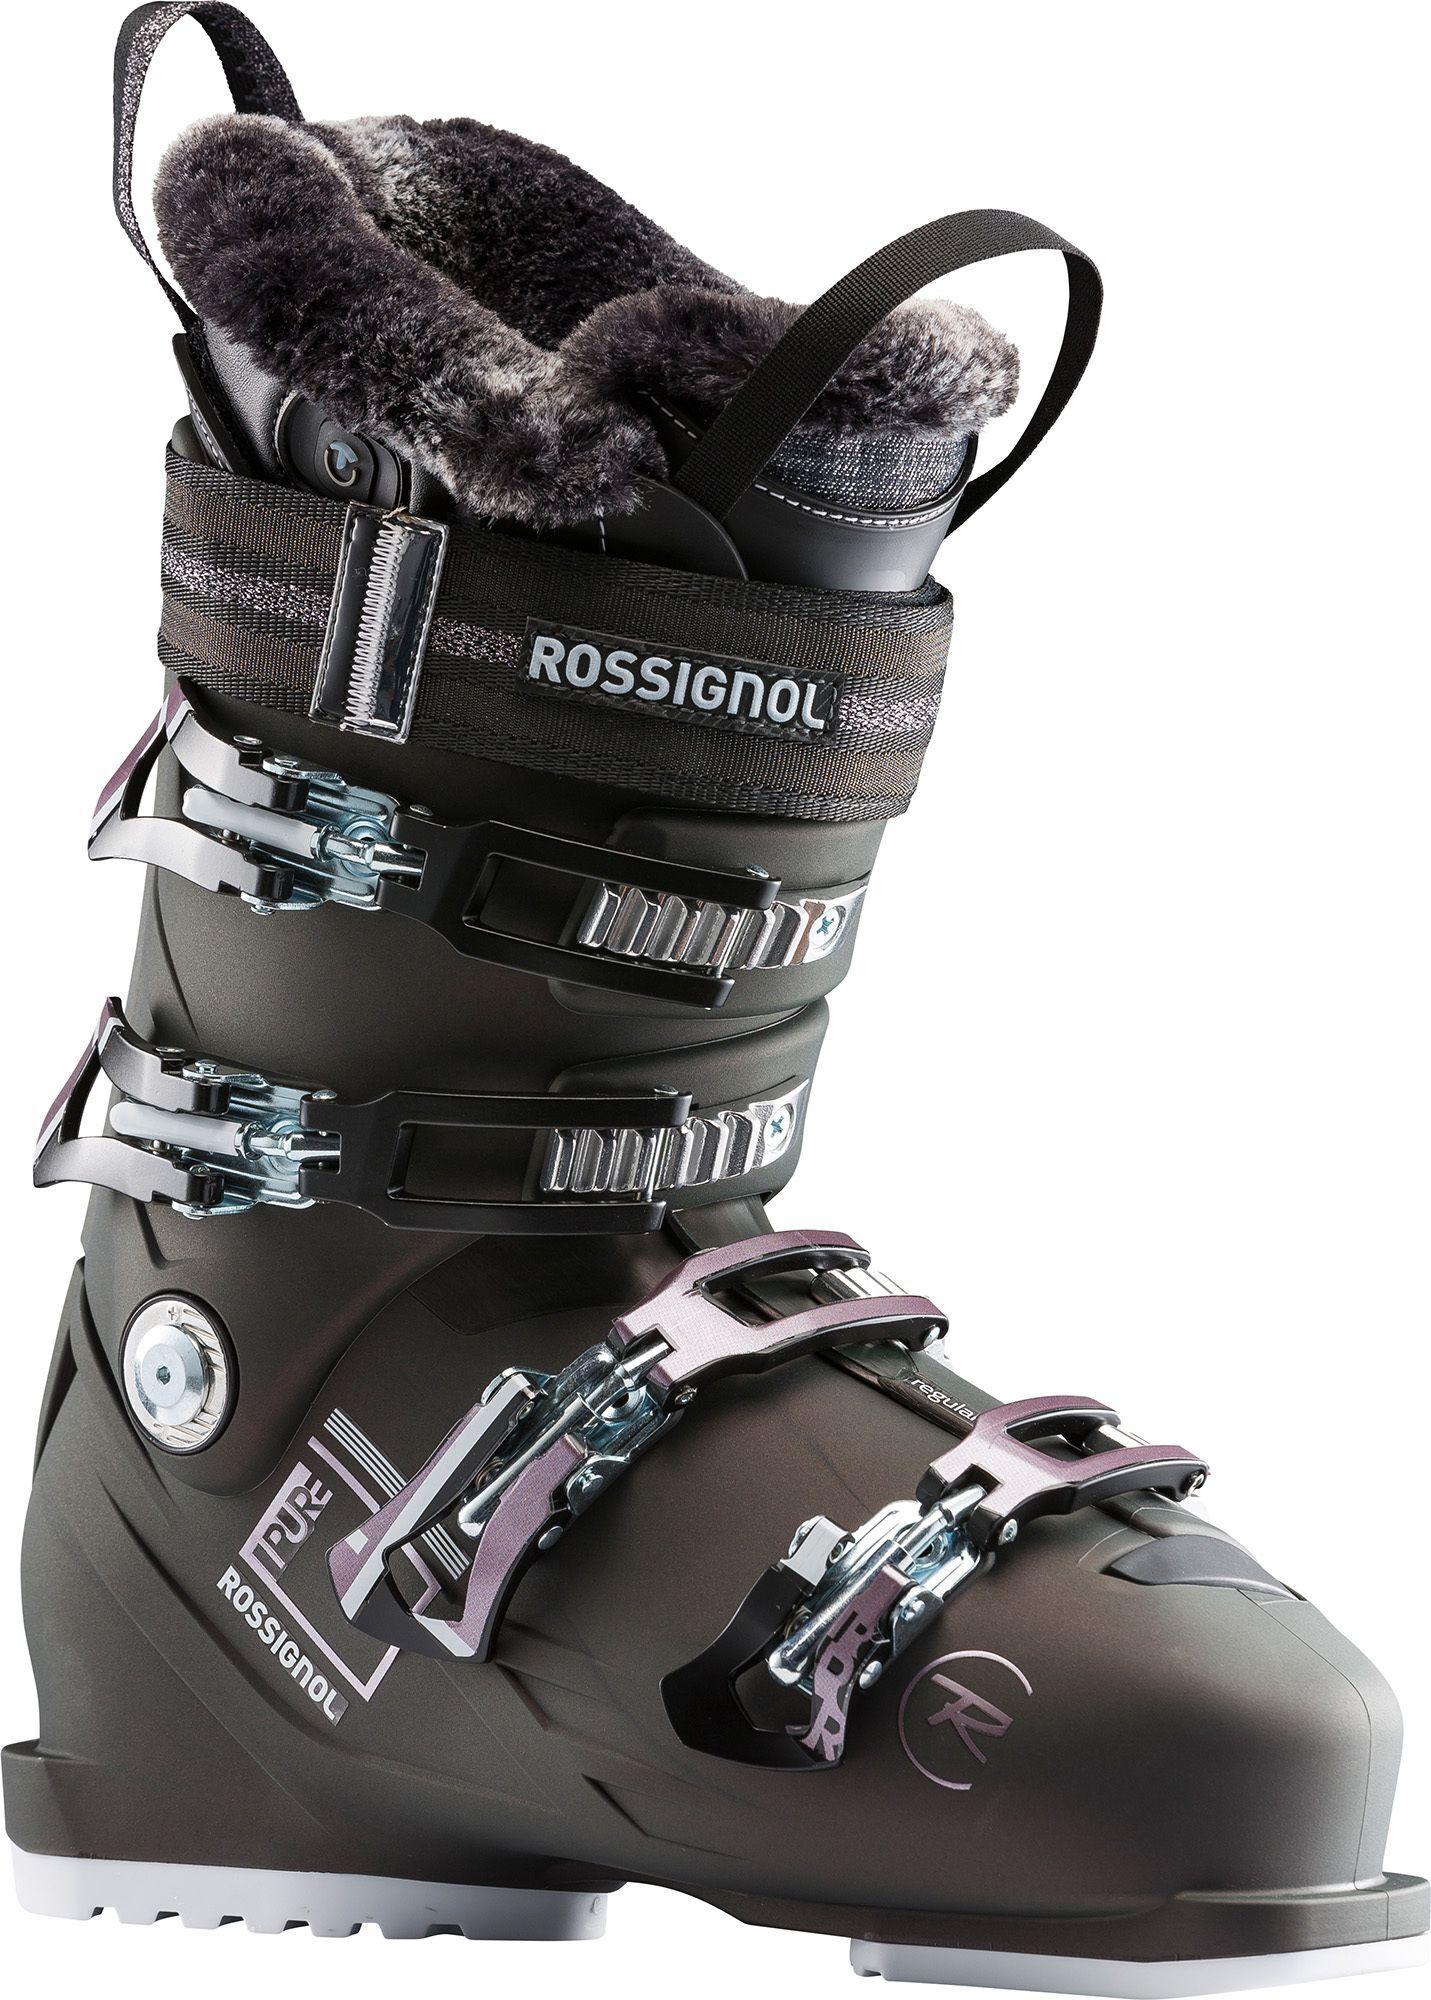 Rossignol ski cipele PURE HEAT - IRIDESCENT BLACK